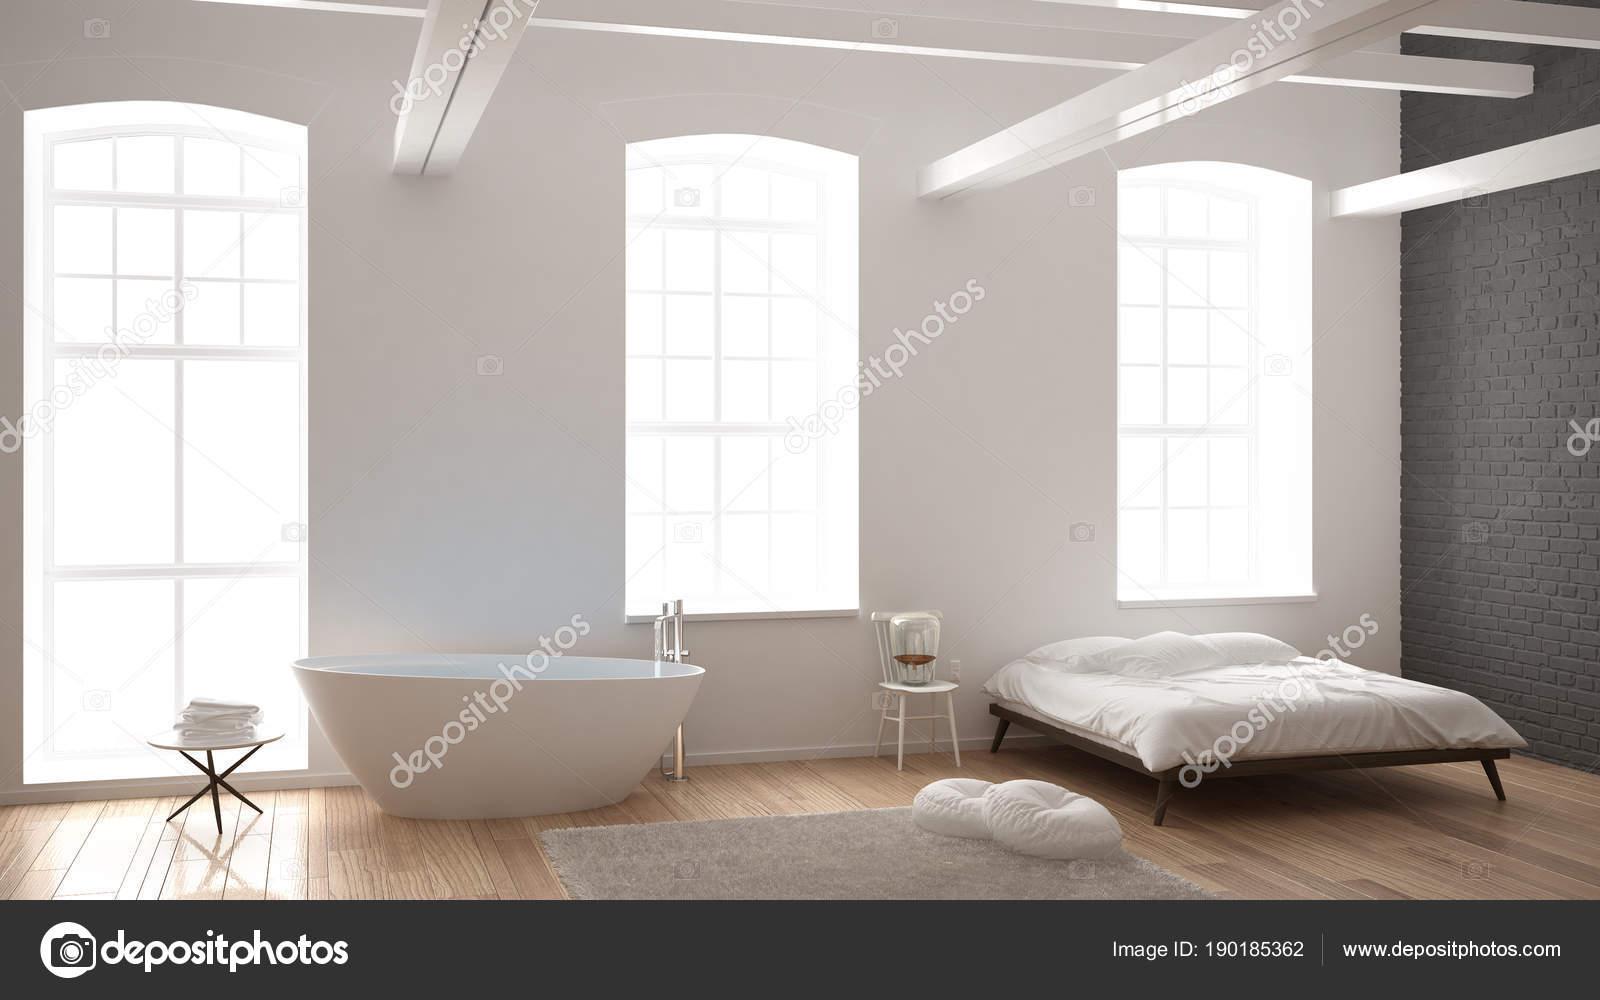 https://st3.depositphotos.com/1152281/19018/i/1600/depositphotos_190185362-stockafbeelding-klassieke-industrile-moderne-slaapkamer-met.jpg